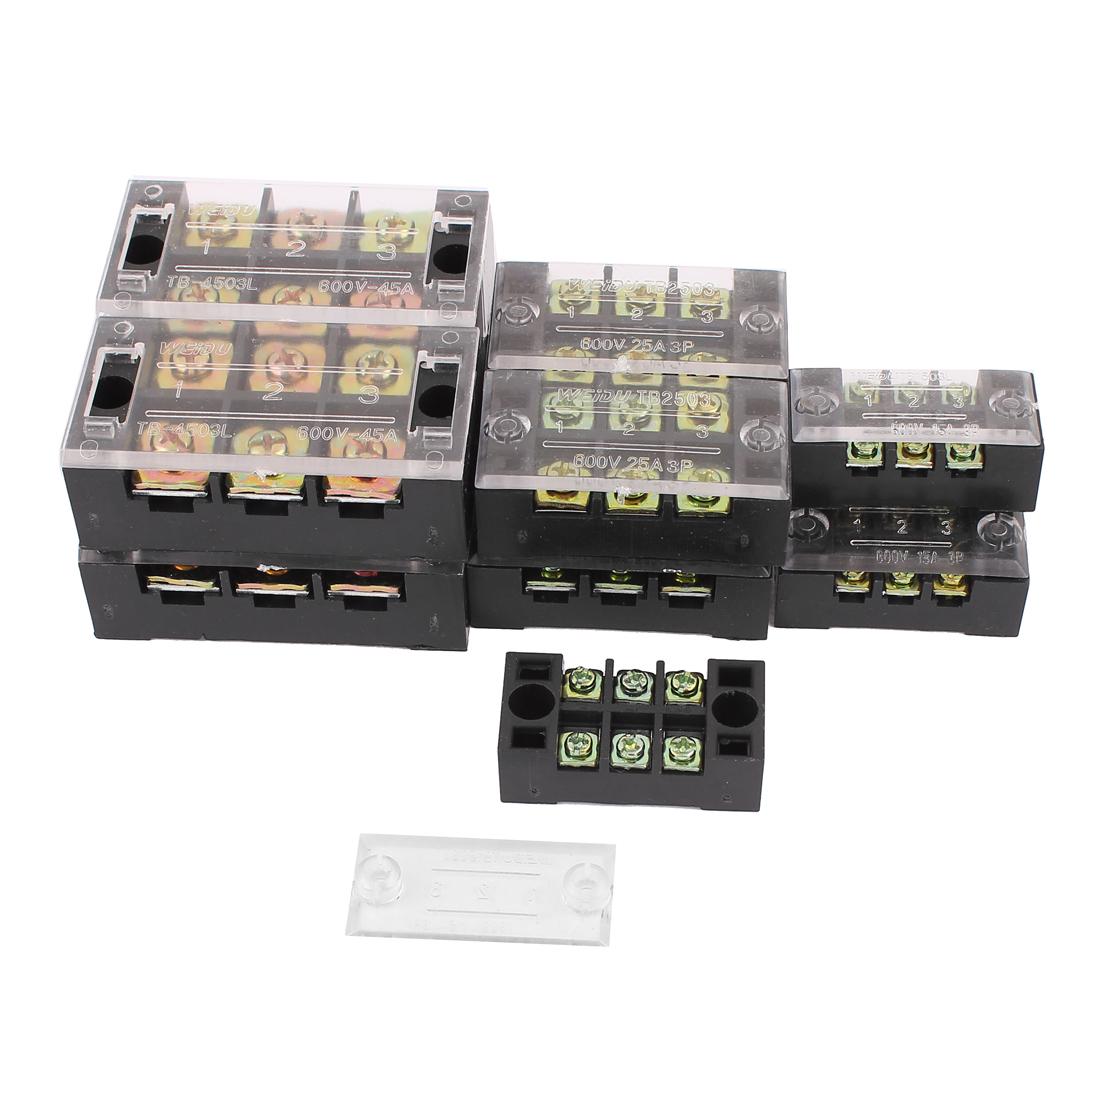 Dual Row 3 Position Insulated Screw Terminal Strip 600V 15A/25A/45A 12pcs